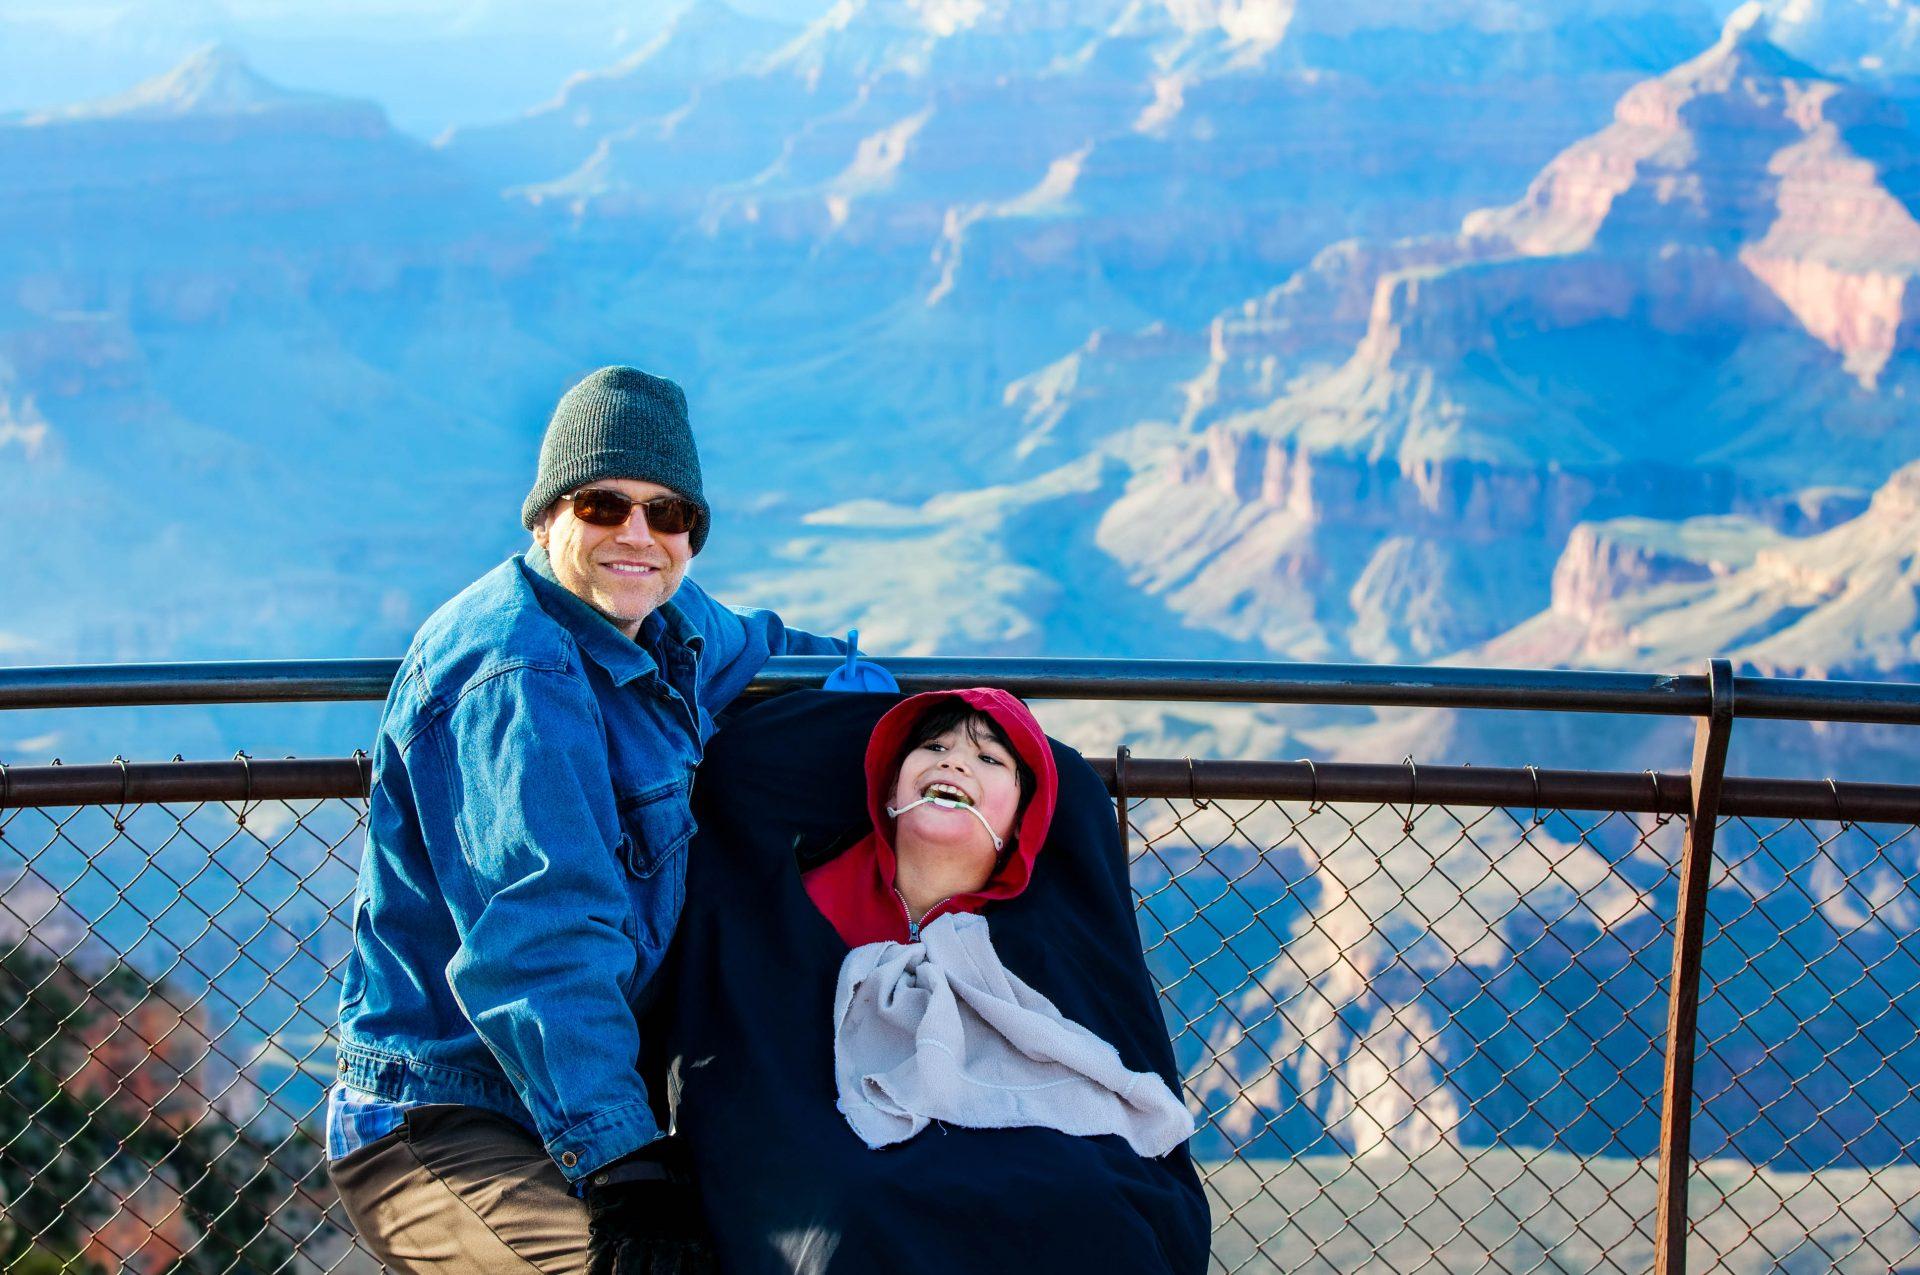 Vater und Sohn im Rollstuhl am Grand Canyon